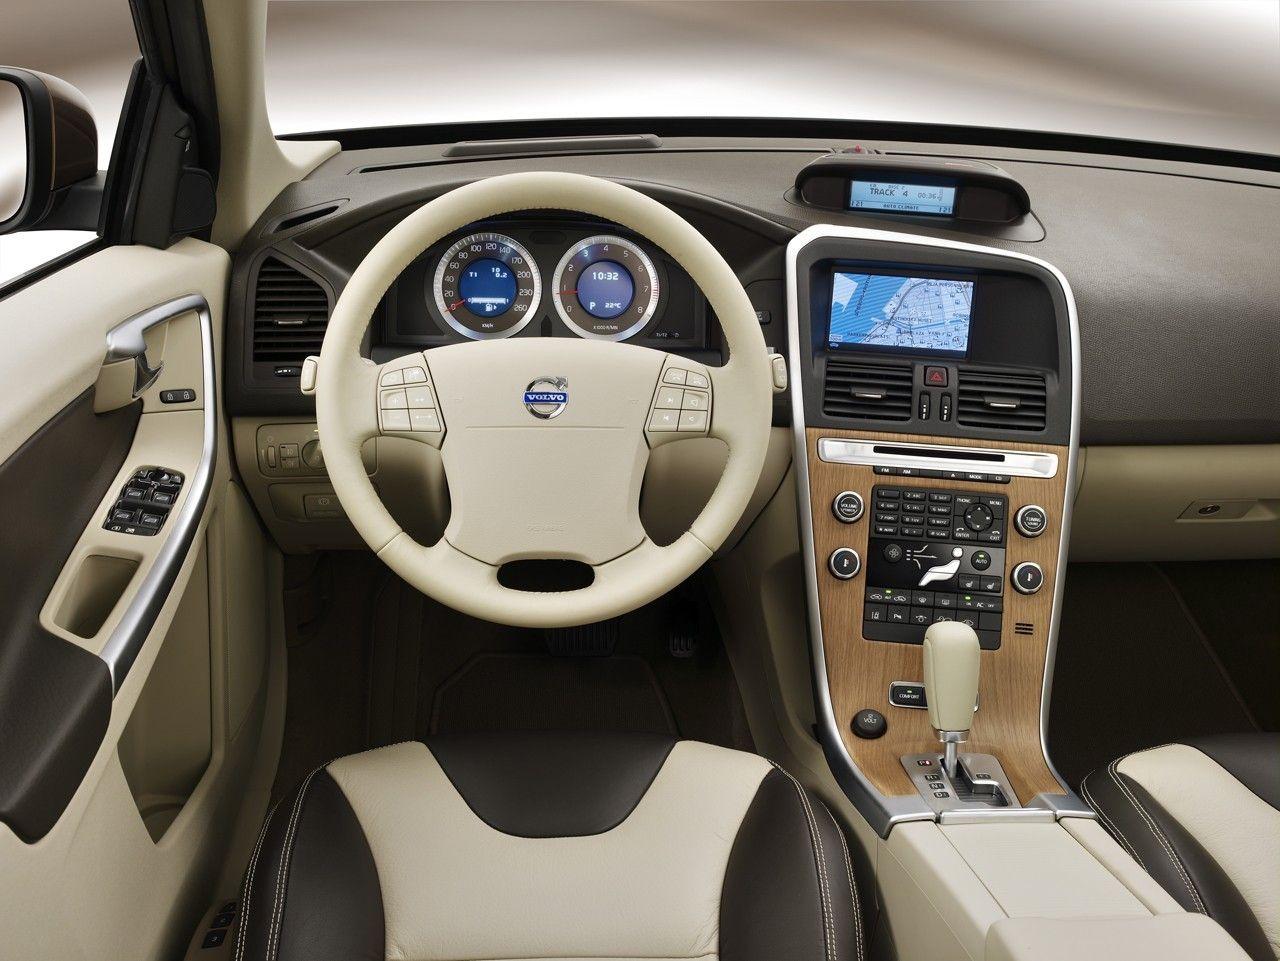 volvo s60 2015 interior. volvo 2014 launch date interior u2013 top car magazine s60 2015